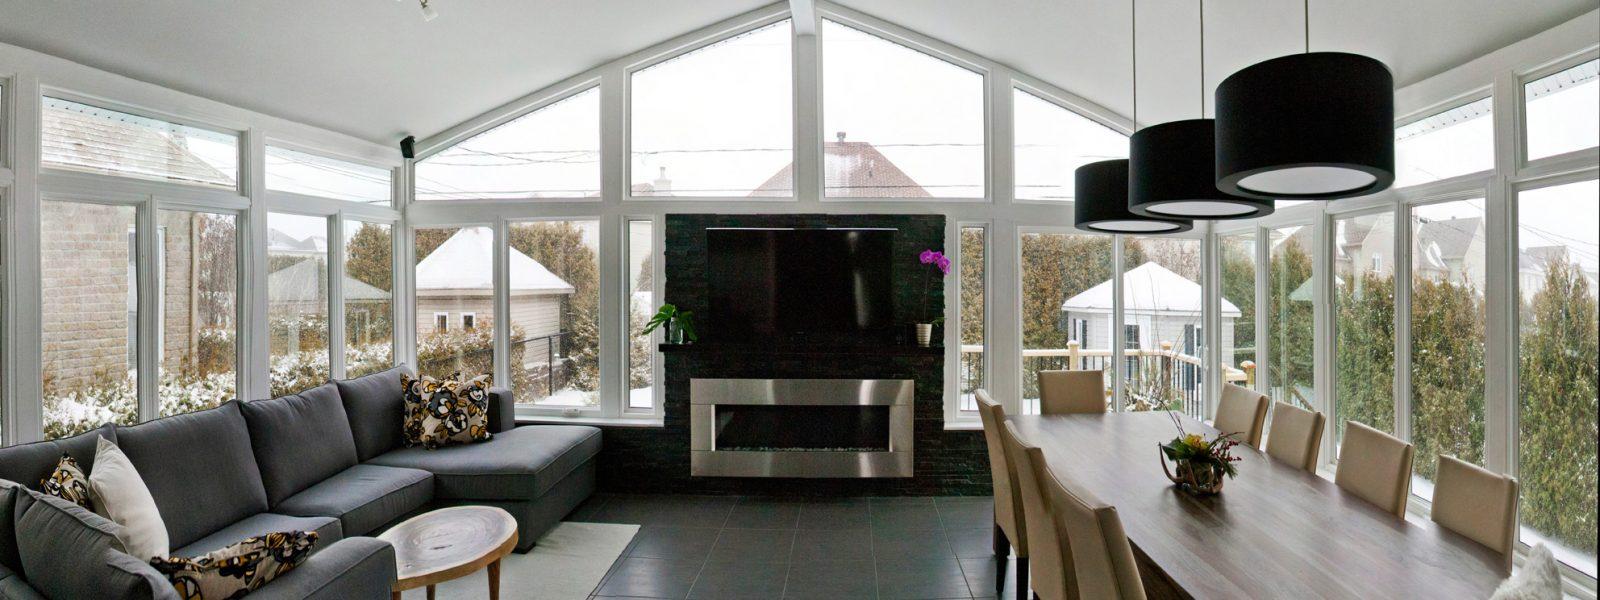 sunroom television room interior design